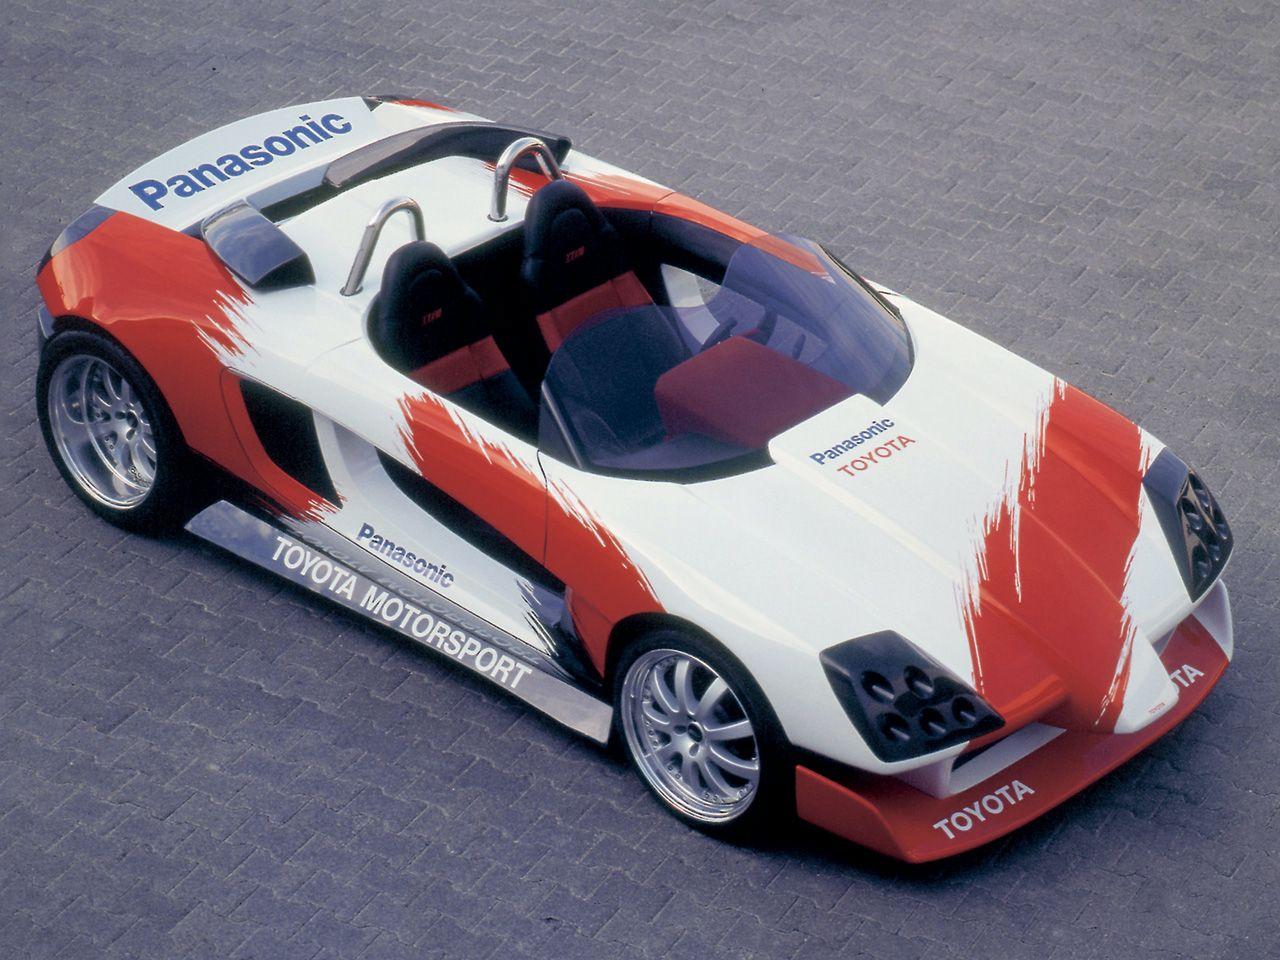 Toyota-MR2-Street-Affair-Concept-8